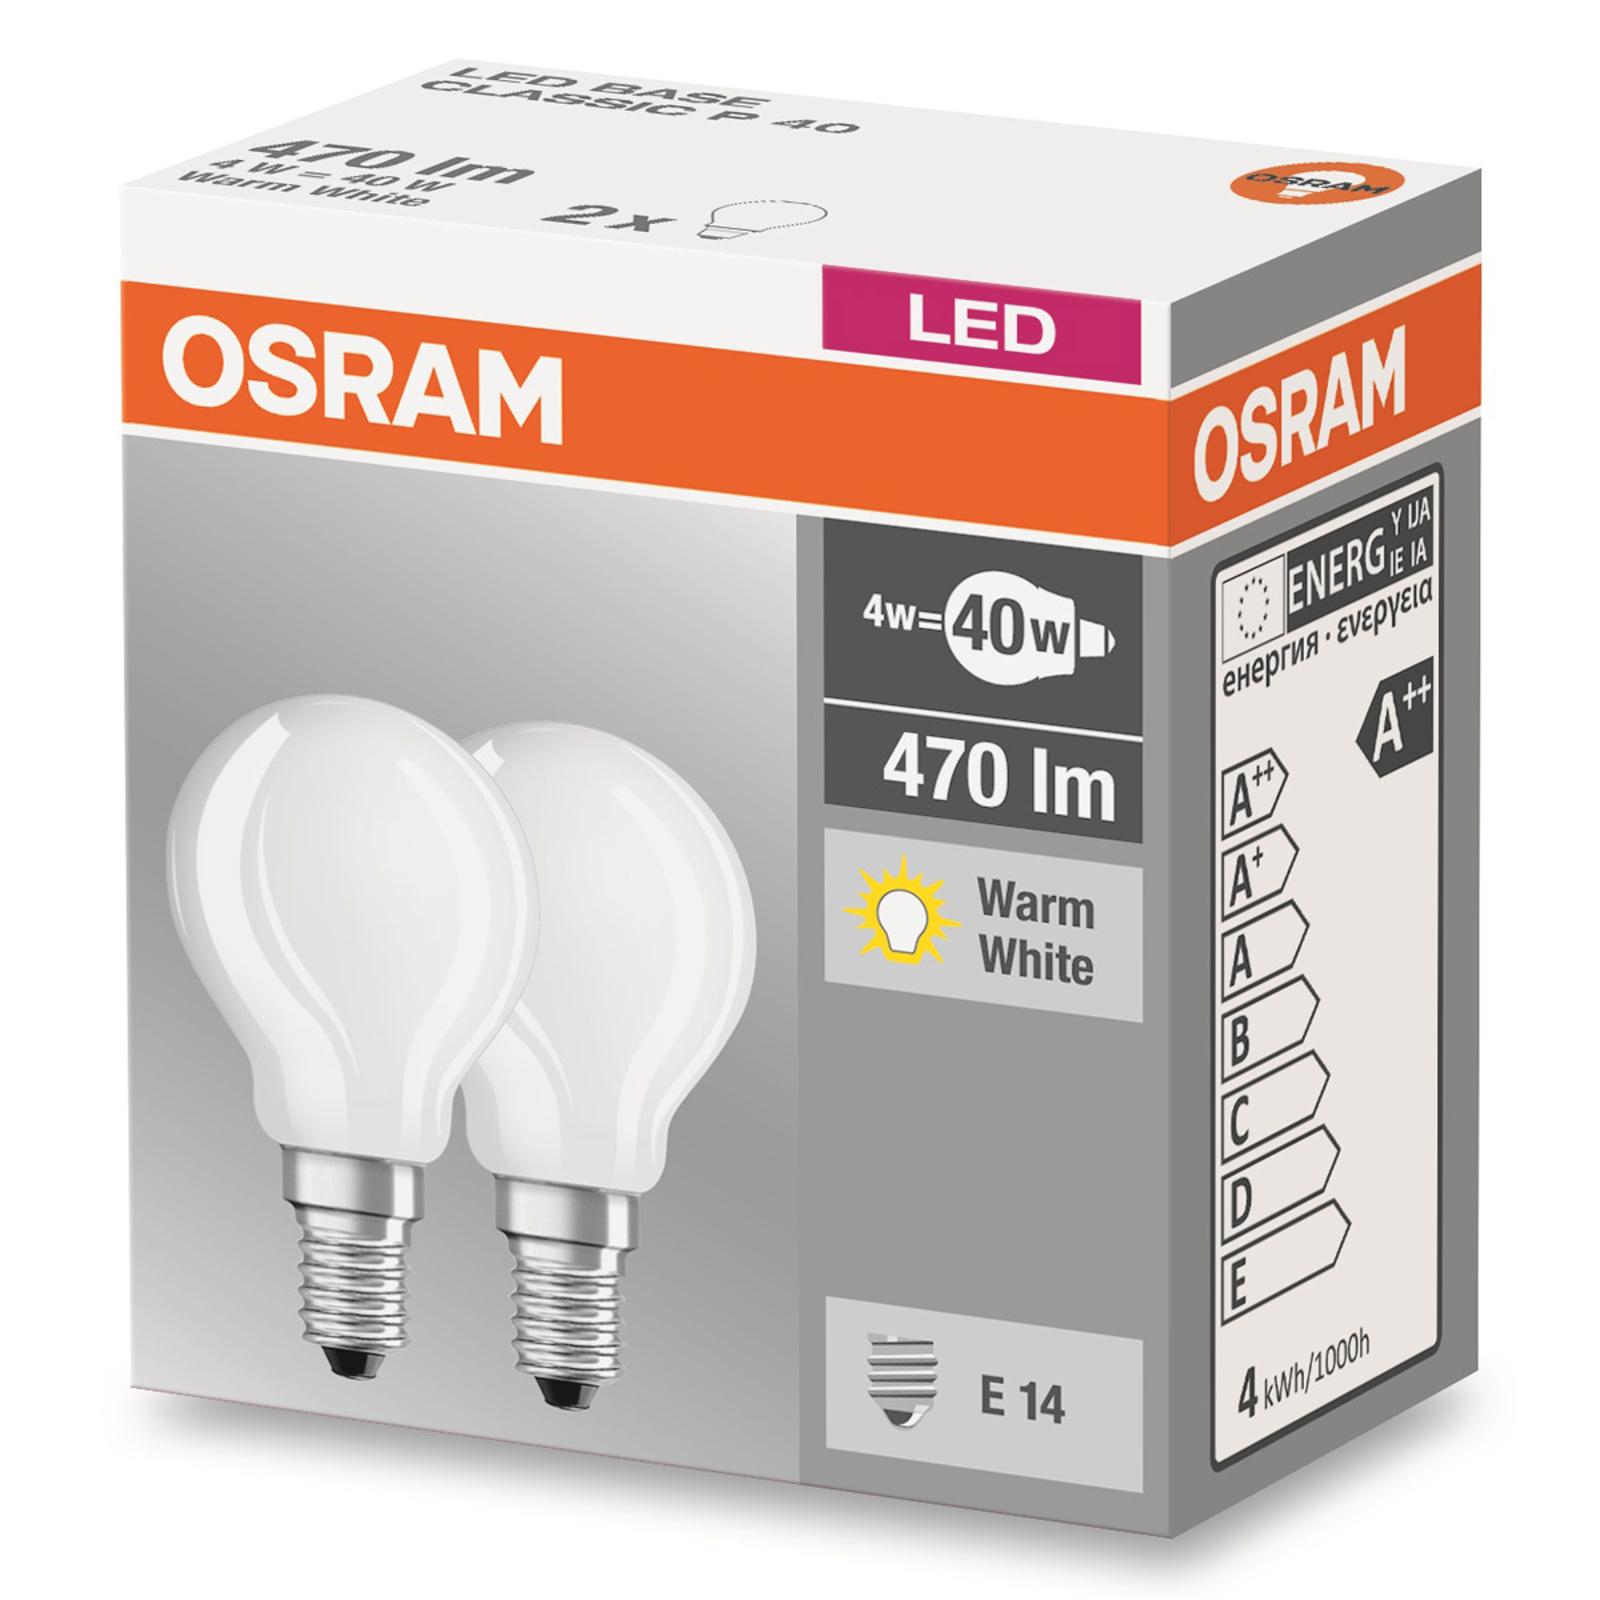 E14 4W 827 LED-pisaralamppu matta 2 kpl:n setti